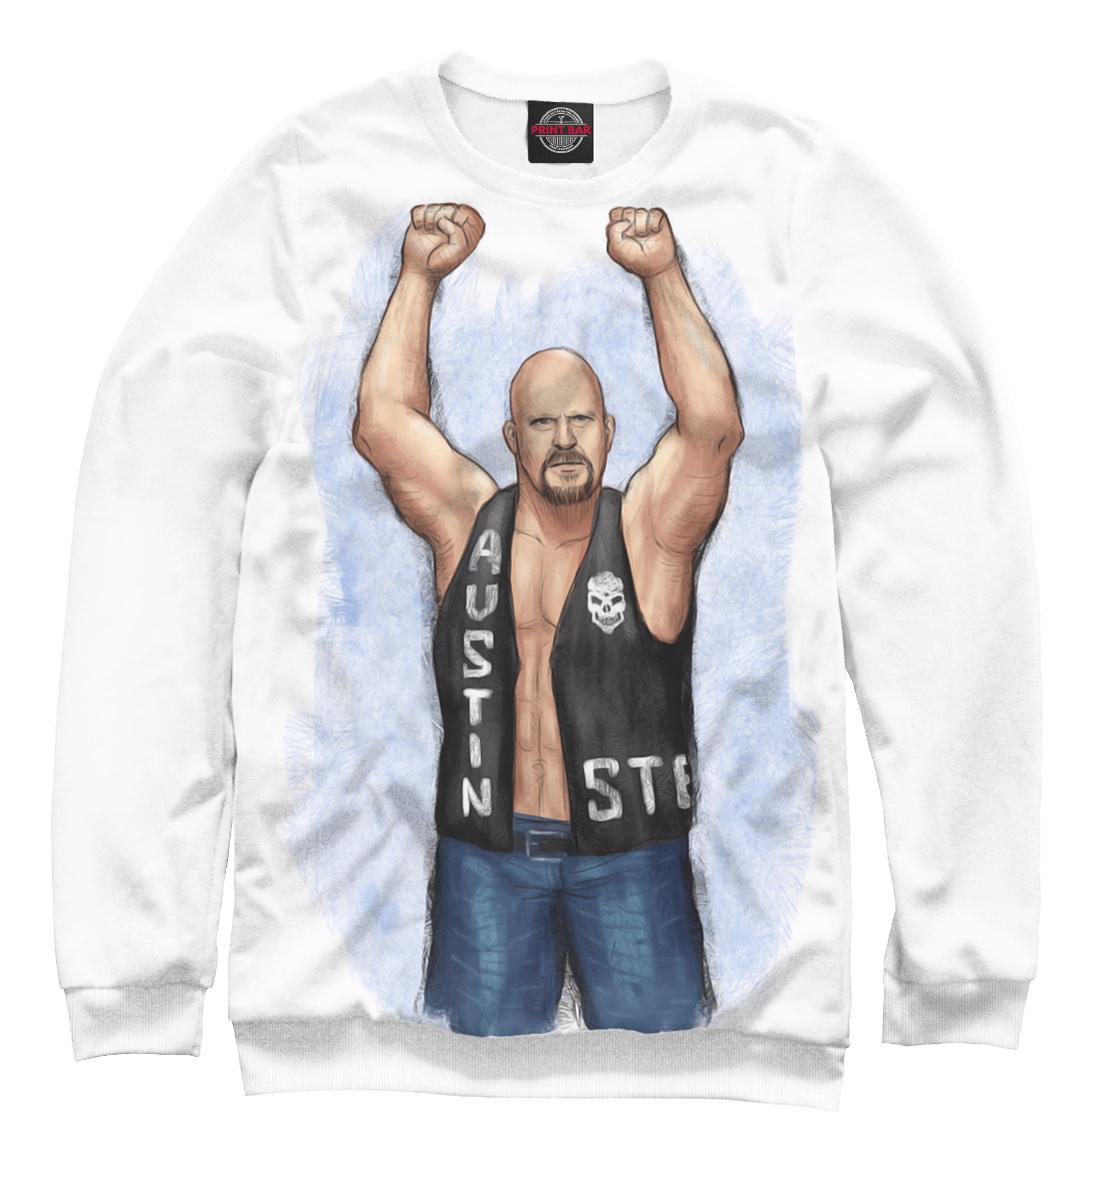 WWE: Стив Остин